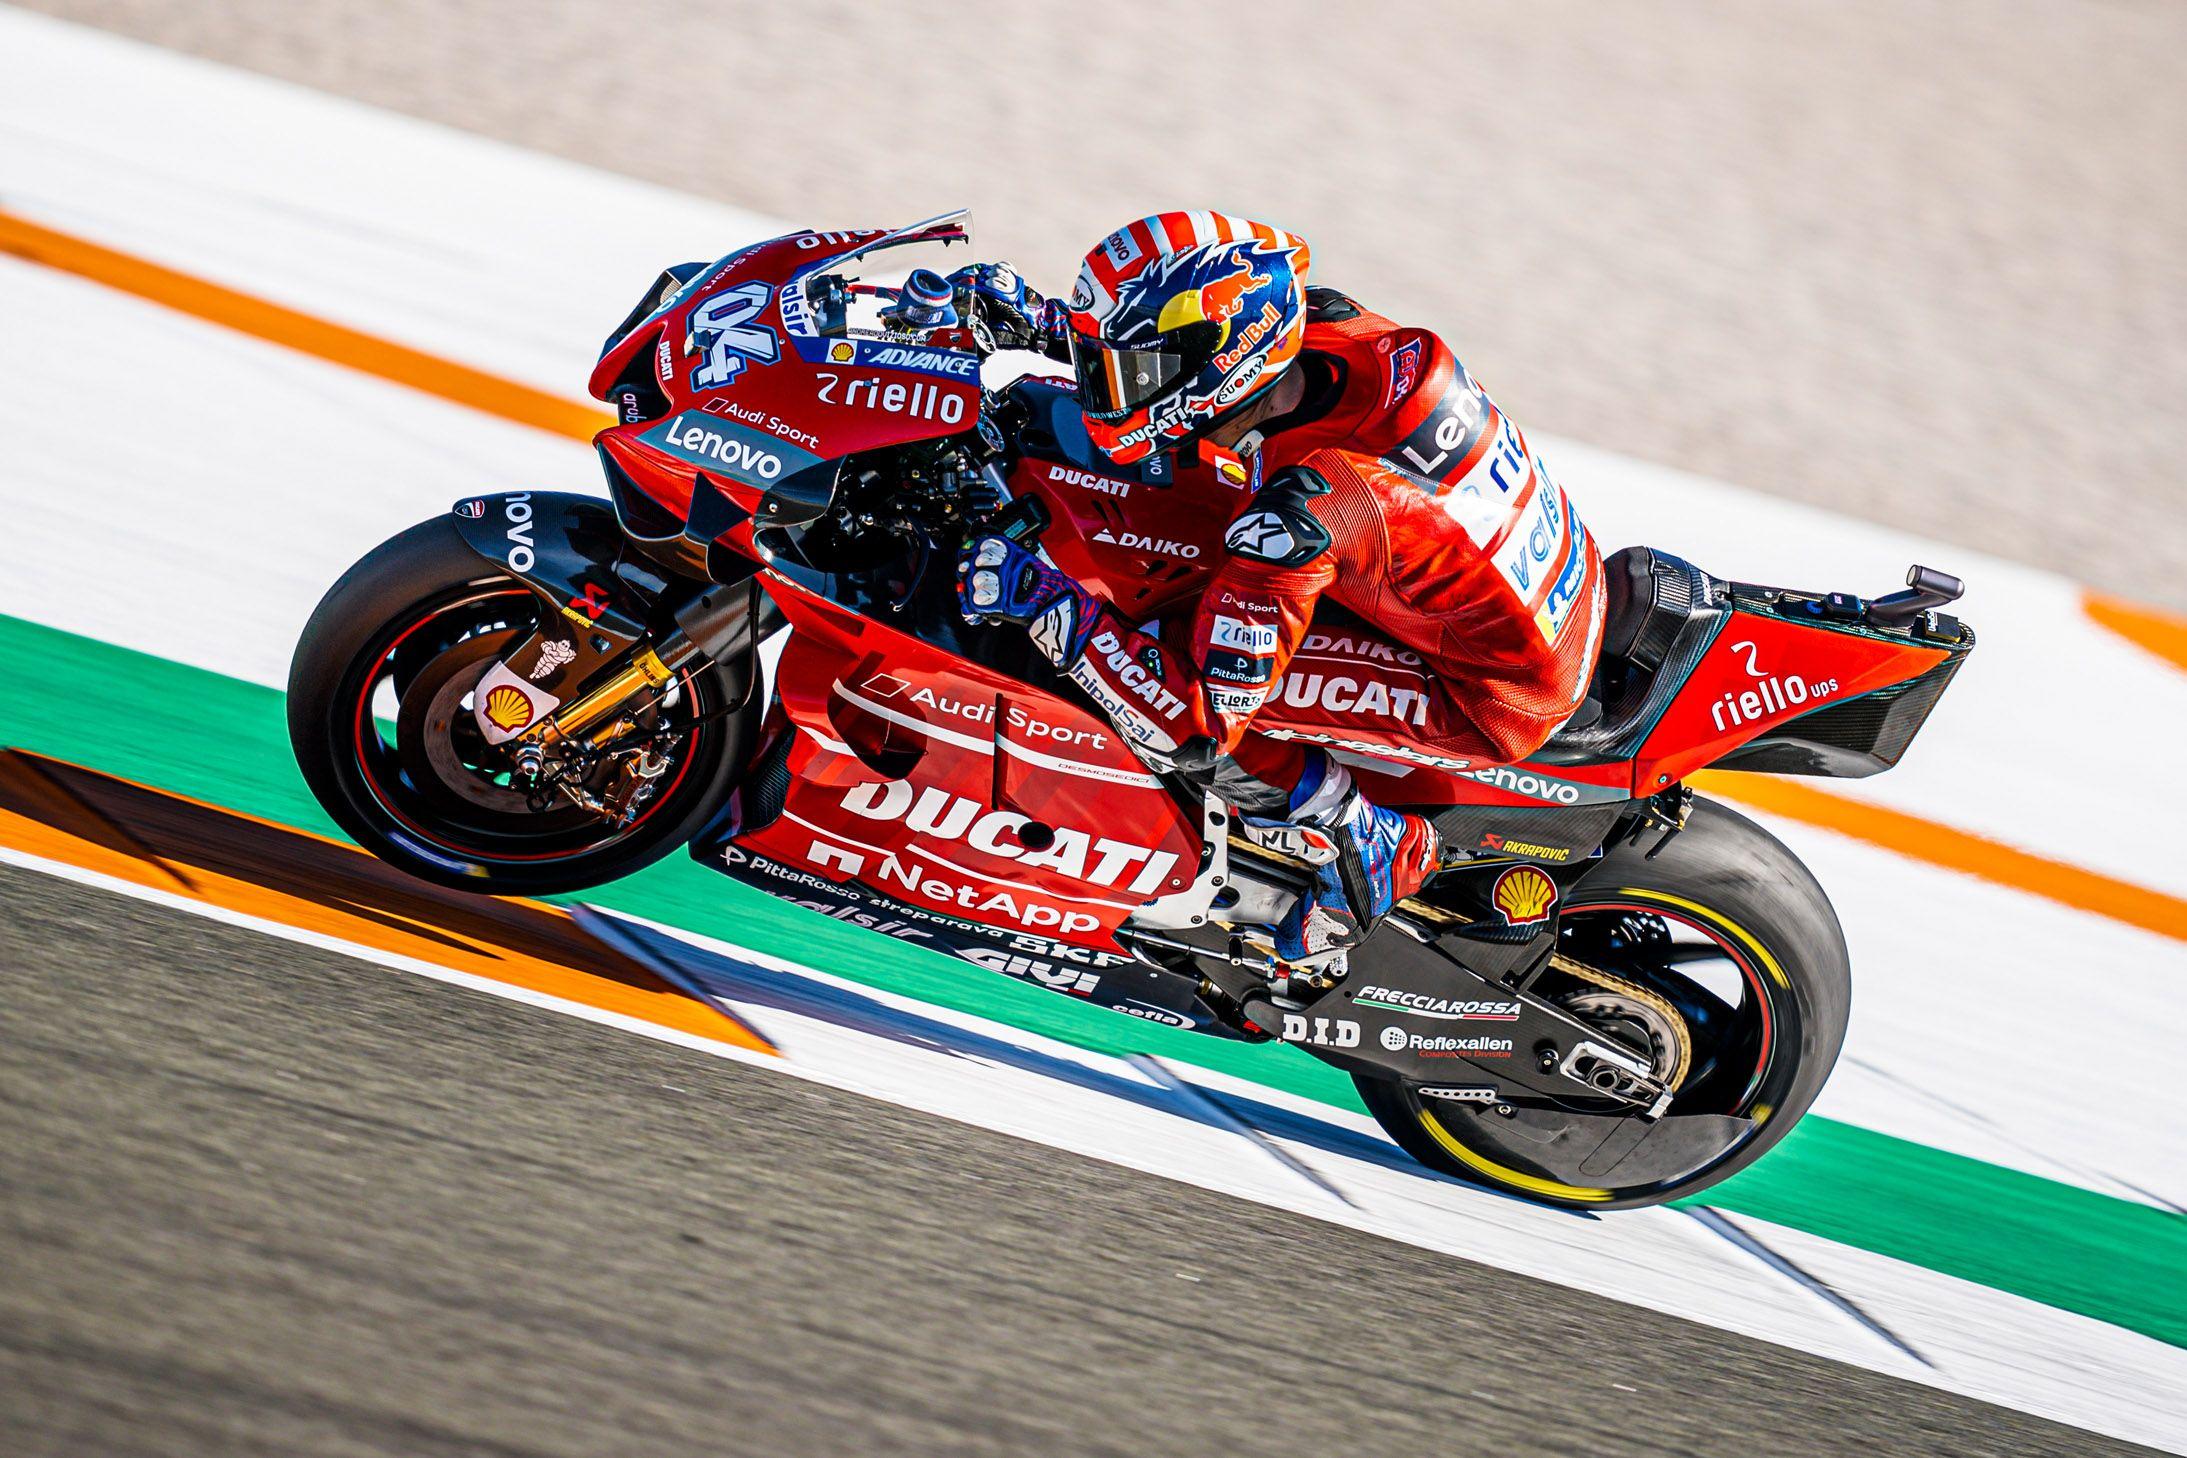 2020 Motogp Season Officially Gets Underway At Valencia Ducati Testing At The Ricardo Tormo Circuit Ducati Motogp Motogp Race